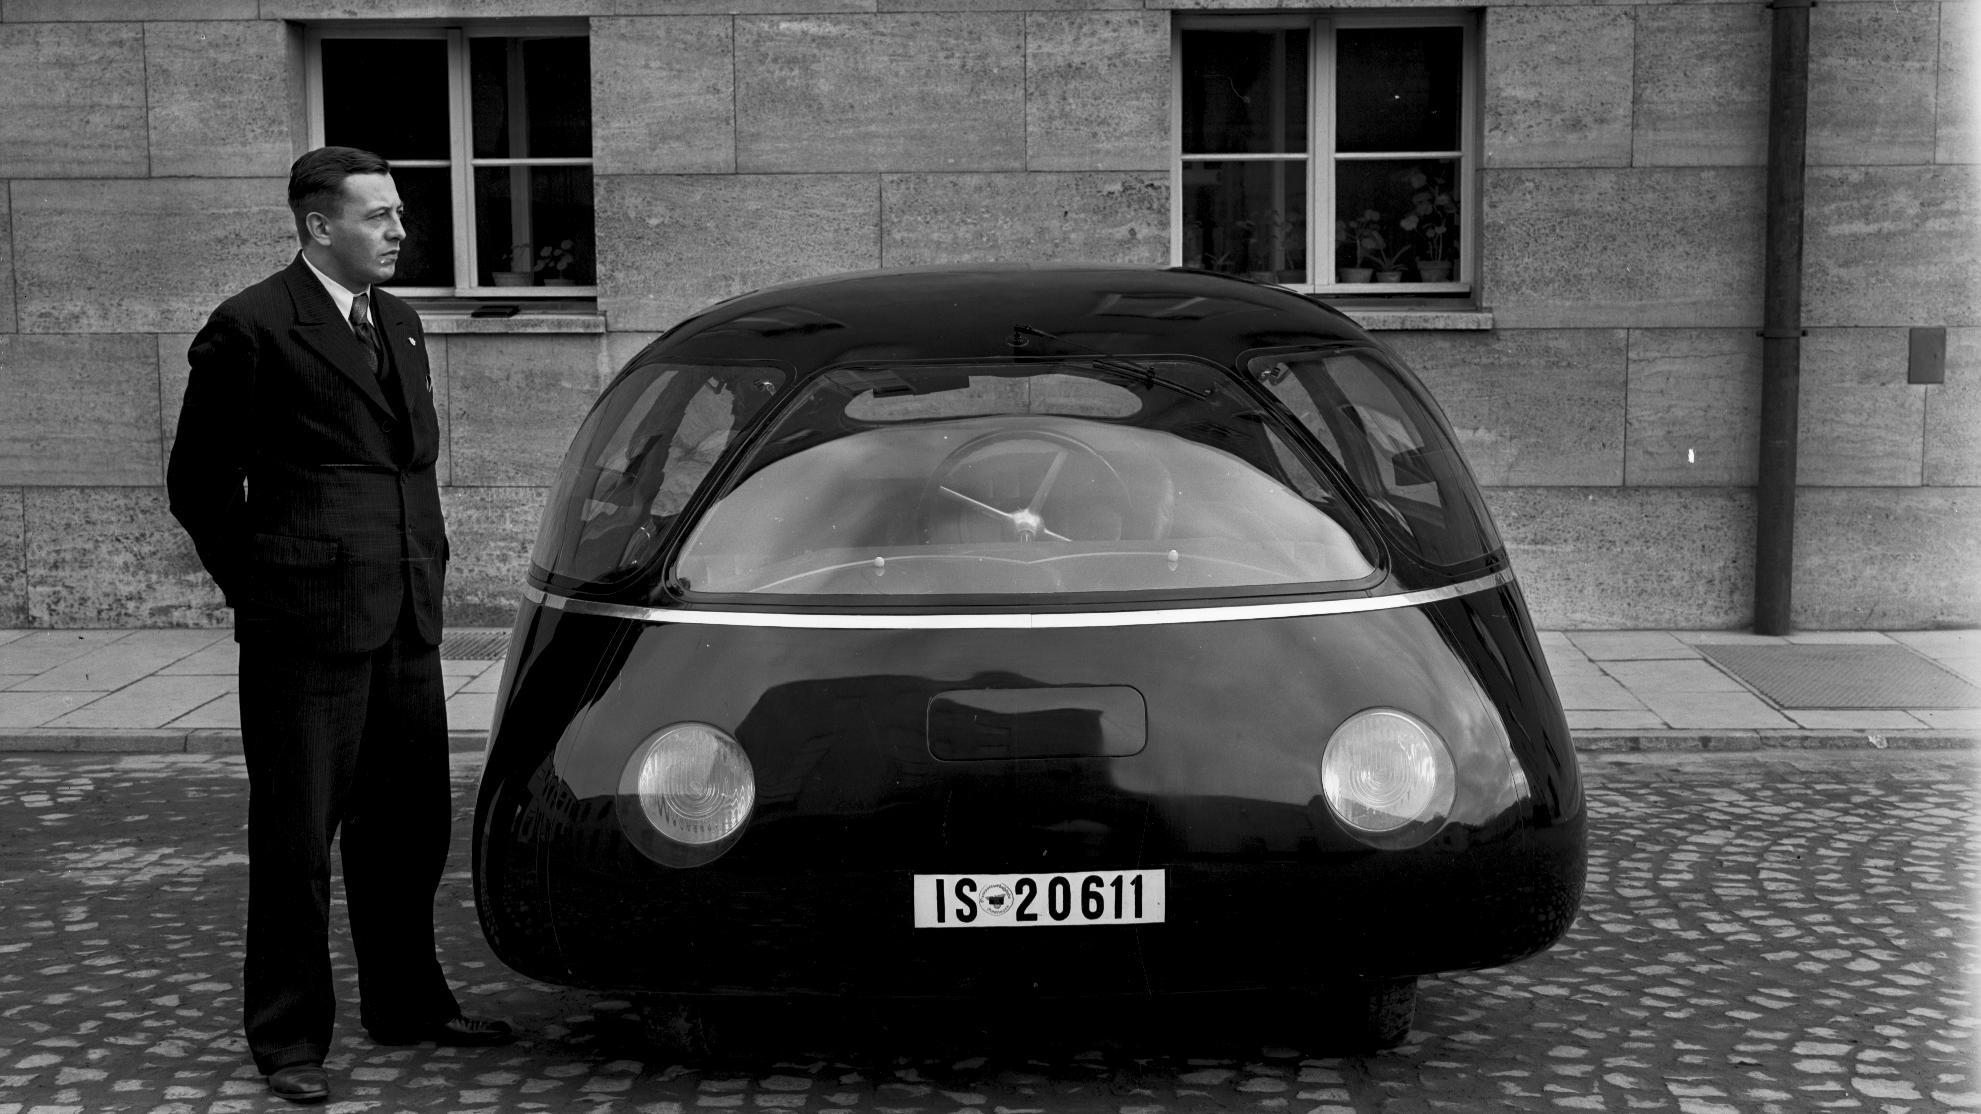 Schl%C3%B6rwagen_from_the_front.jpg